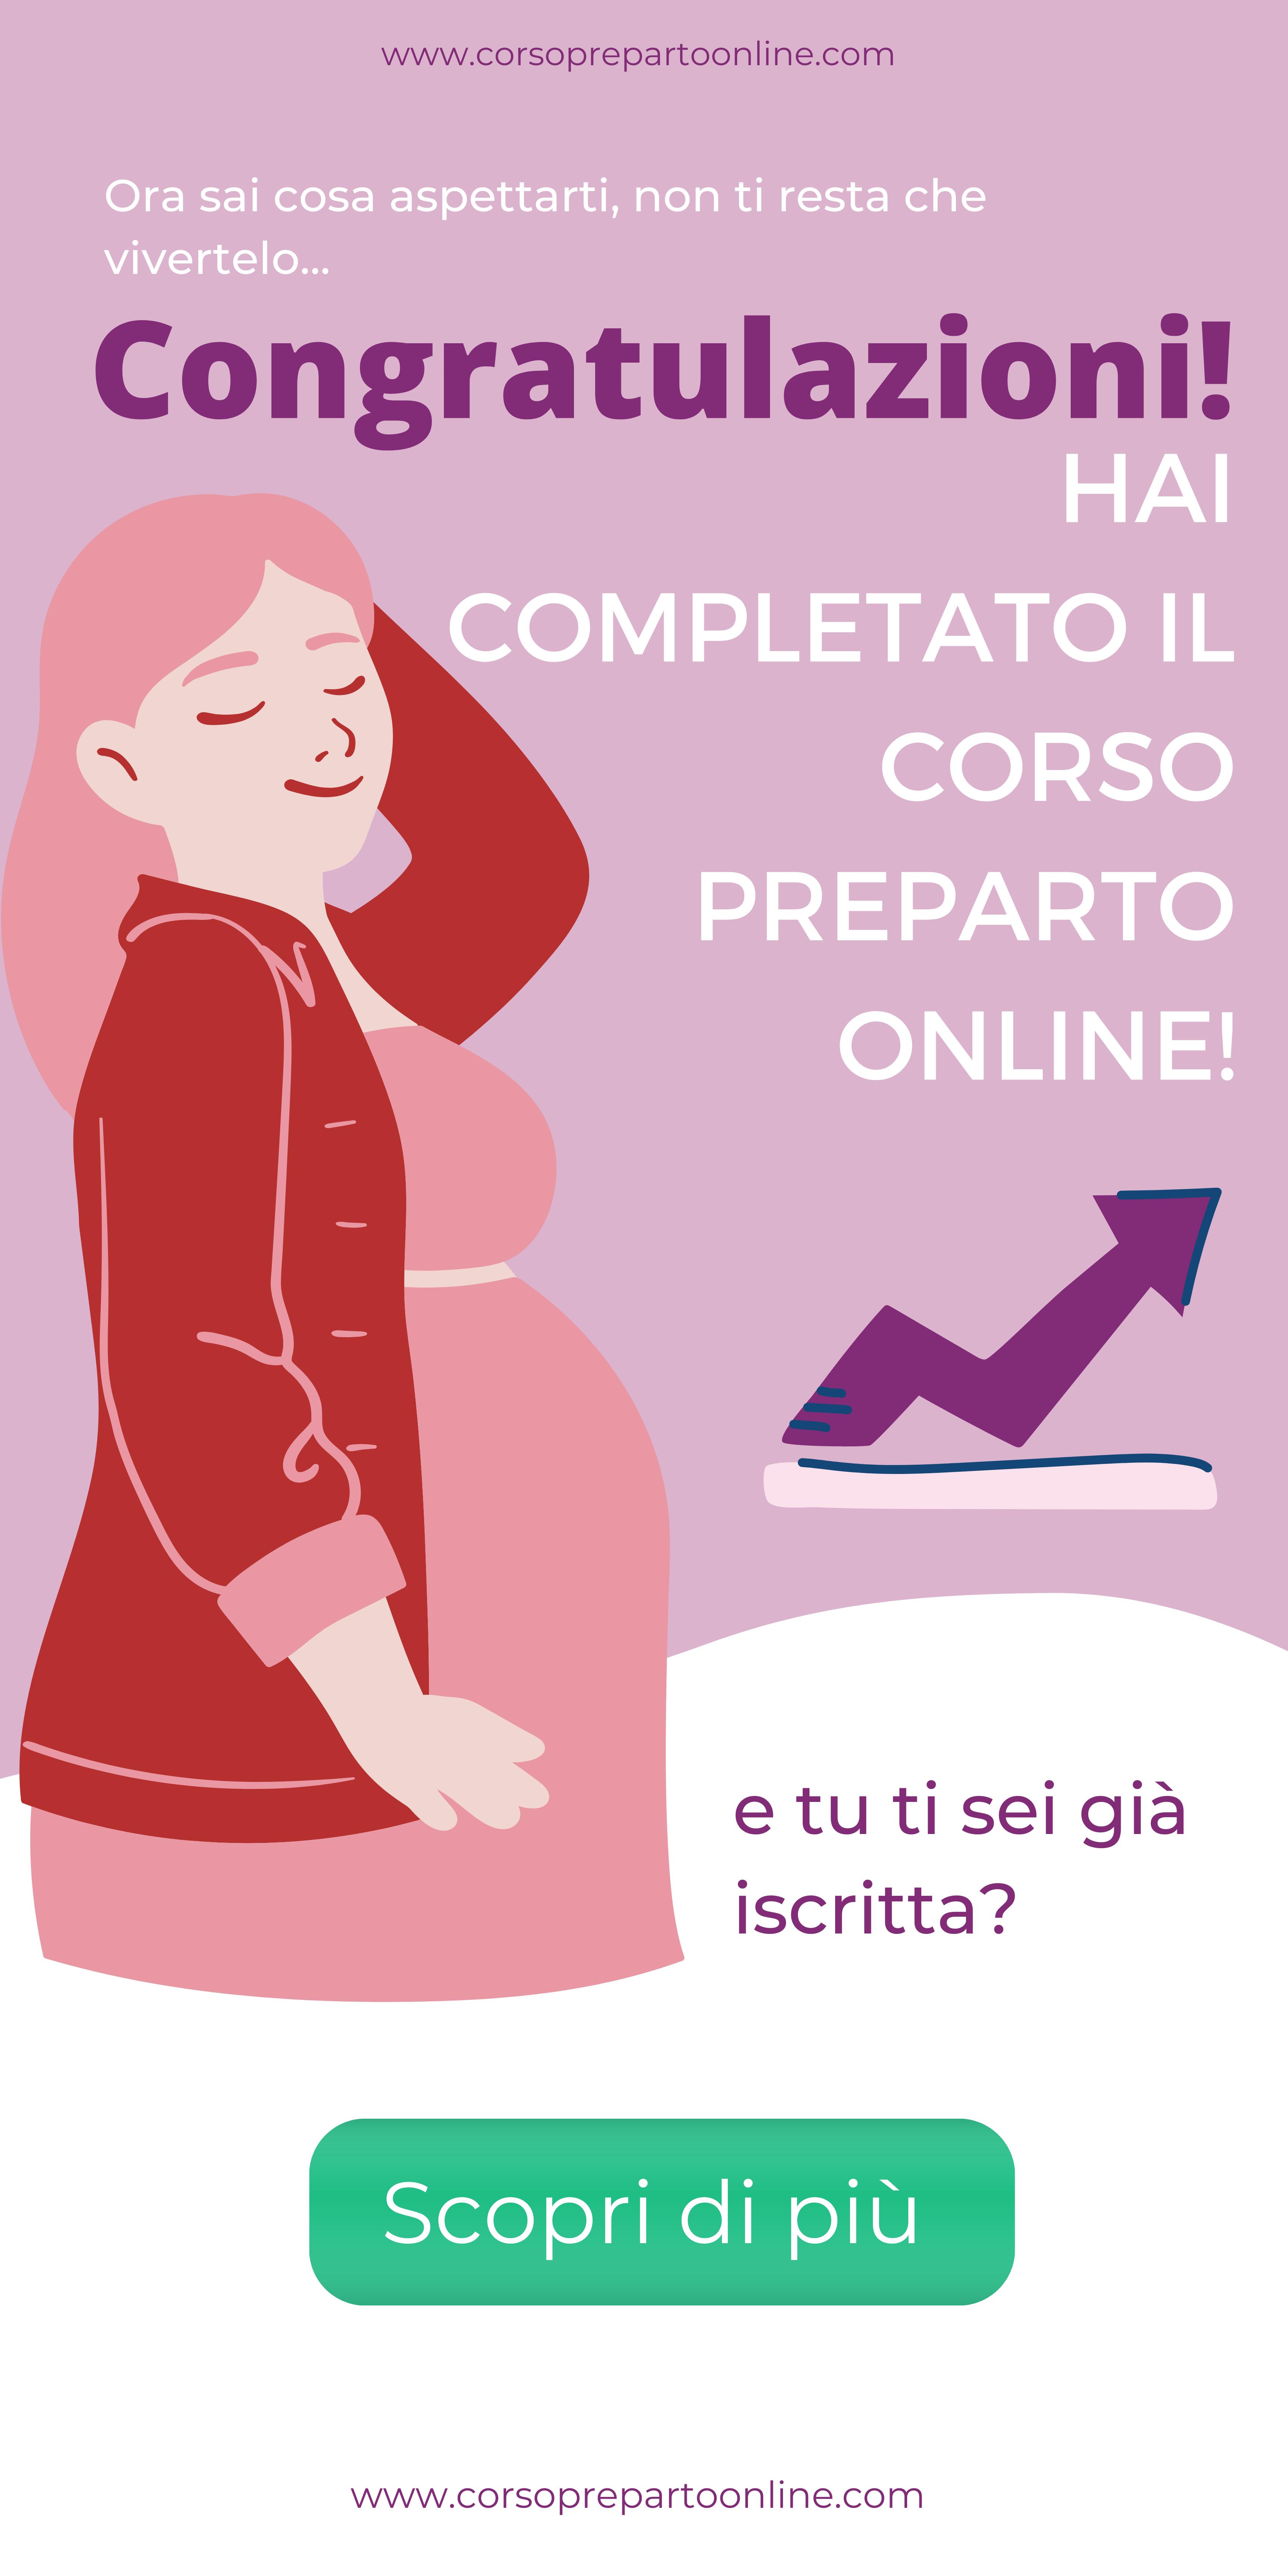 corso preparto online